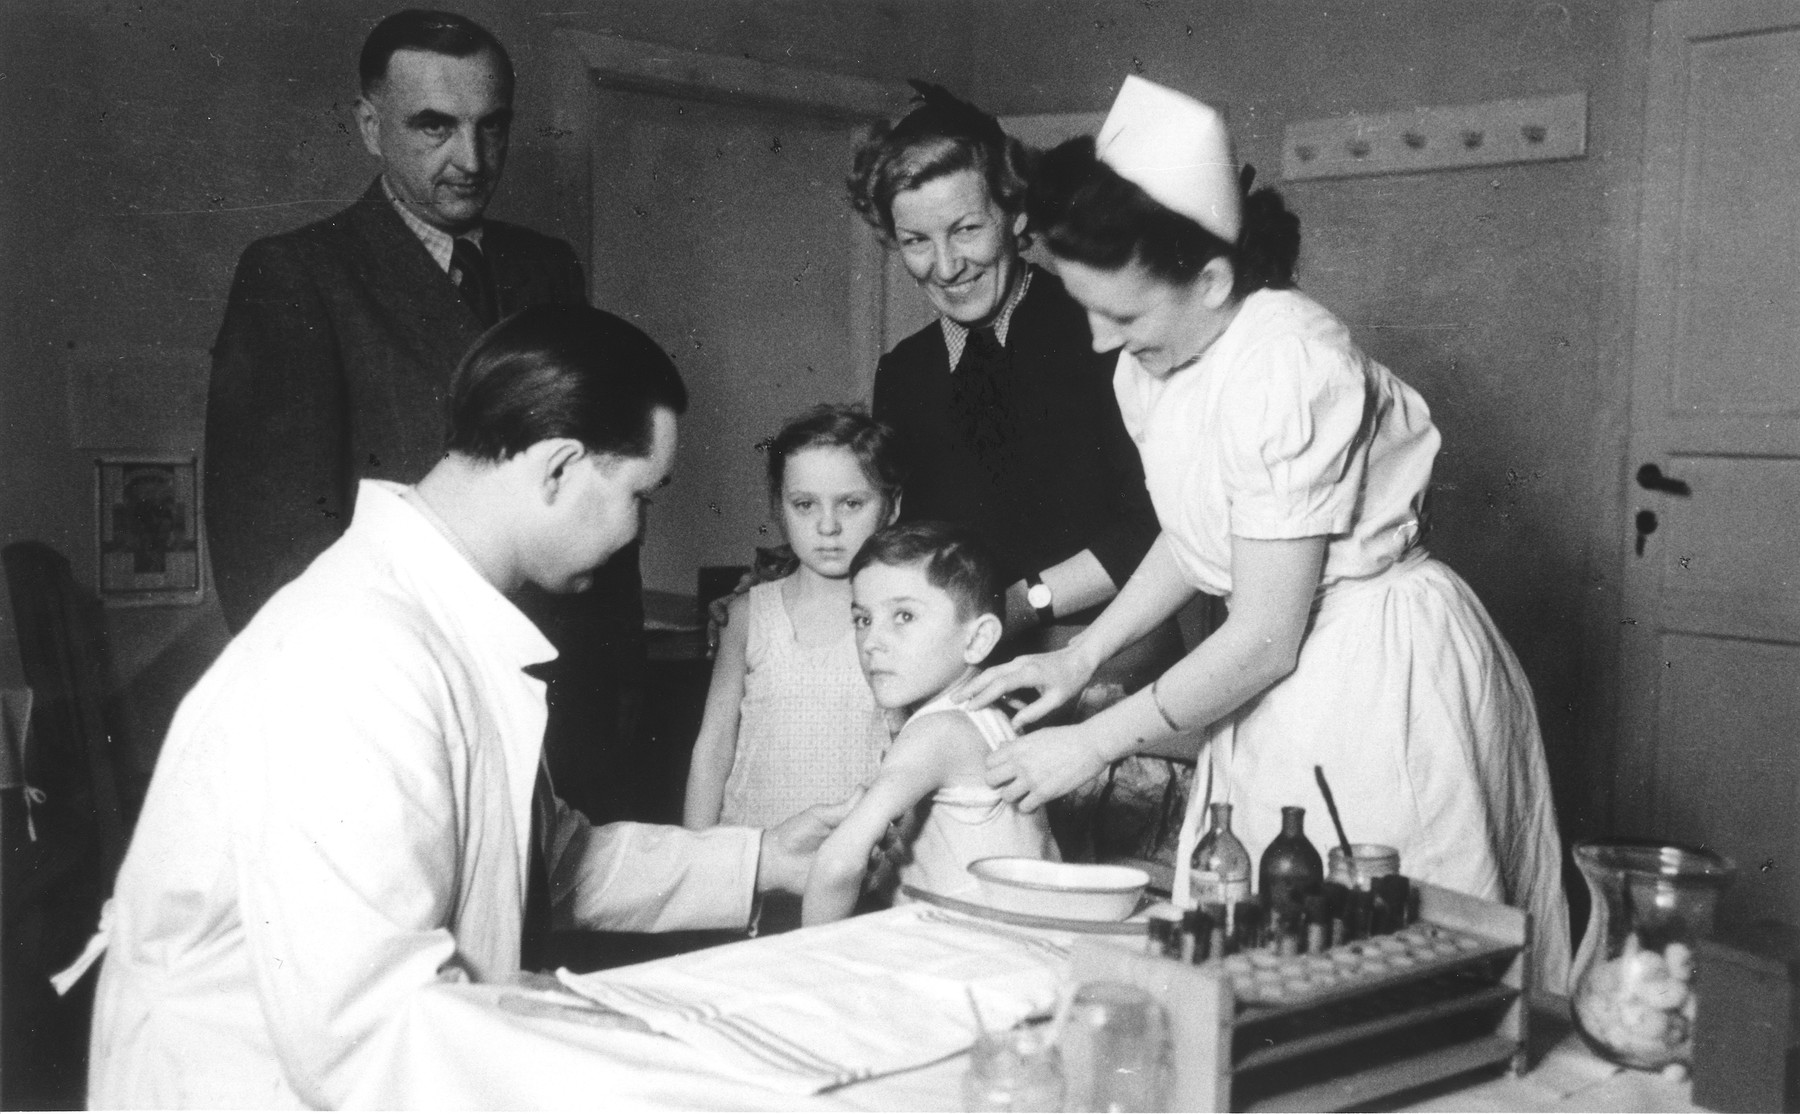 Children receive medical examinations in the Bad Schallerbach home for displaced children.